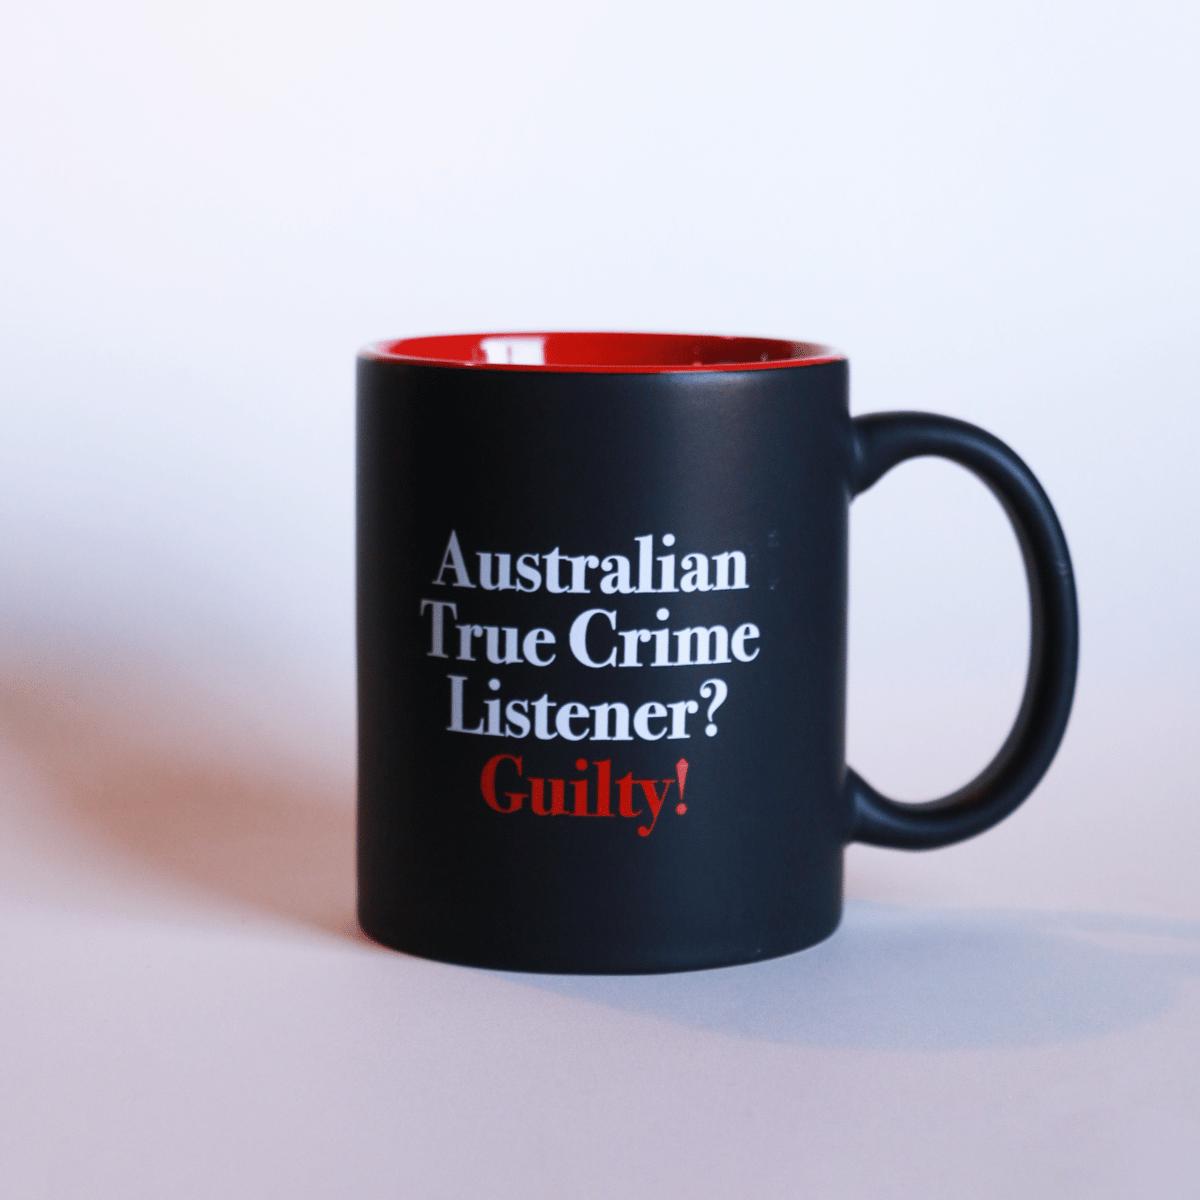 Image of Australian True Crime Podcast Mug